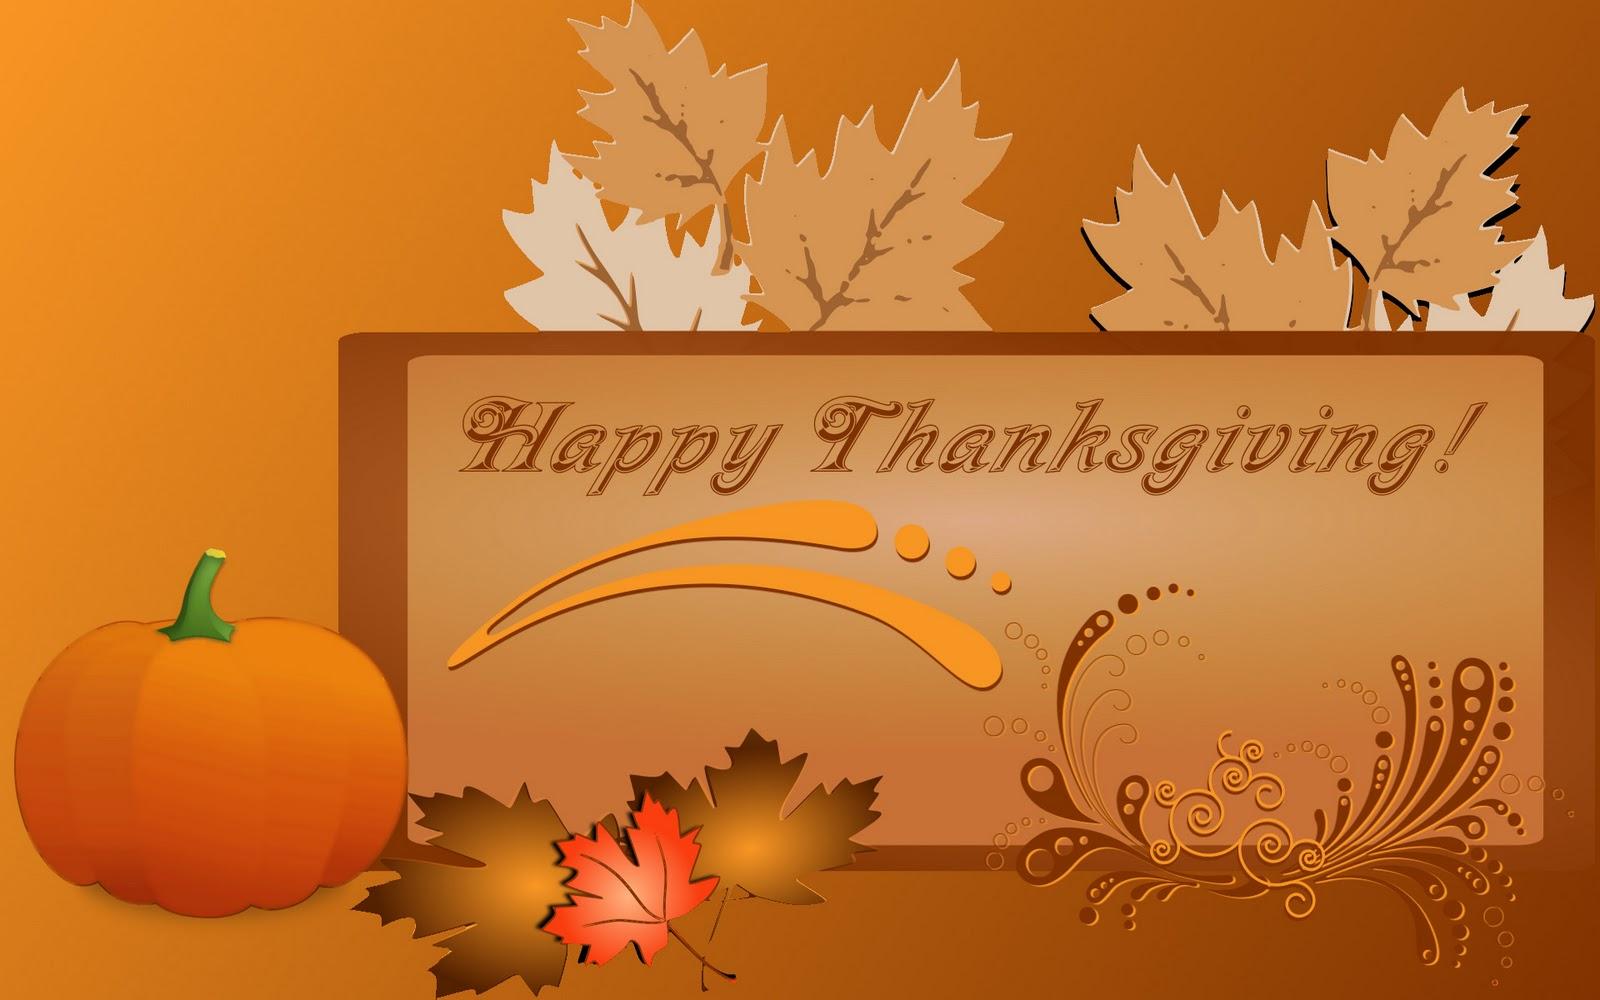 HD]Thanksgiving Wallpaper   Happy Thanksgiving[HD] Wallpapers High 1600x1000